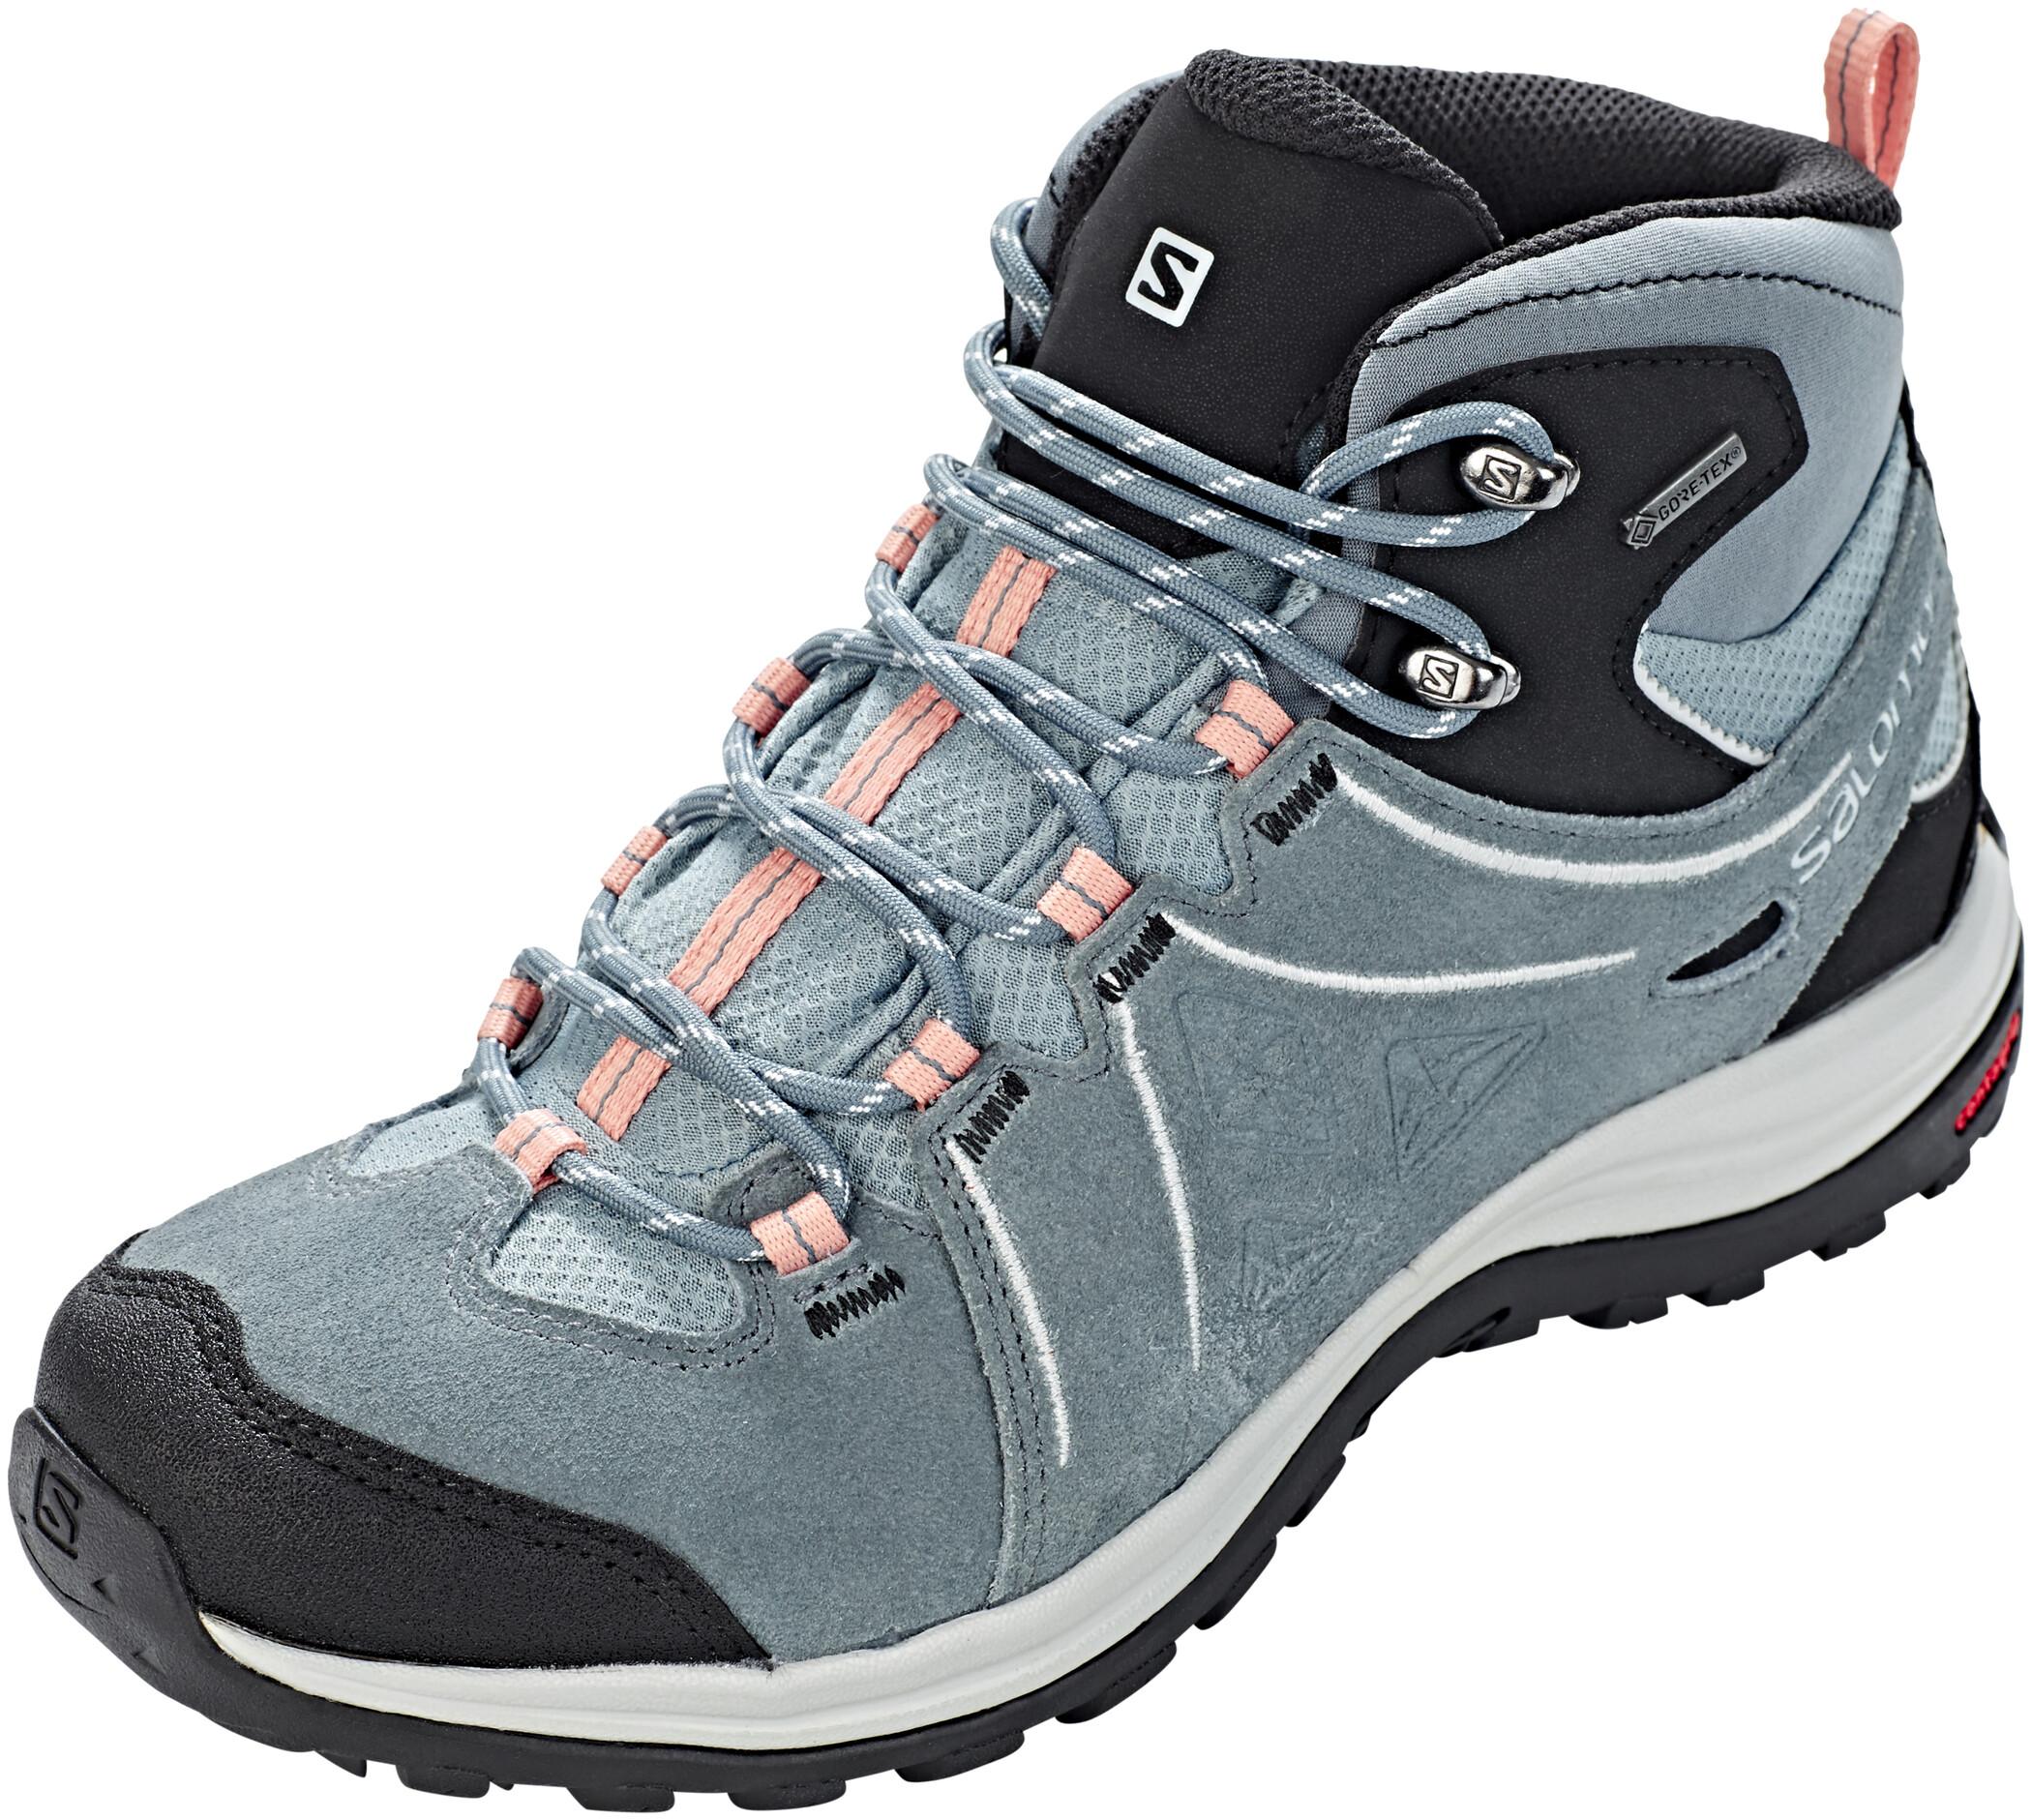 Salomon Ellipse 2 Mid LTR GTX Shoes Dam leadstormy weathercoral almond